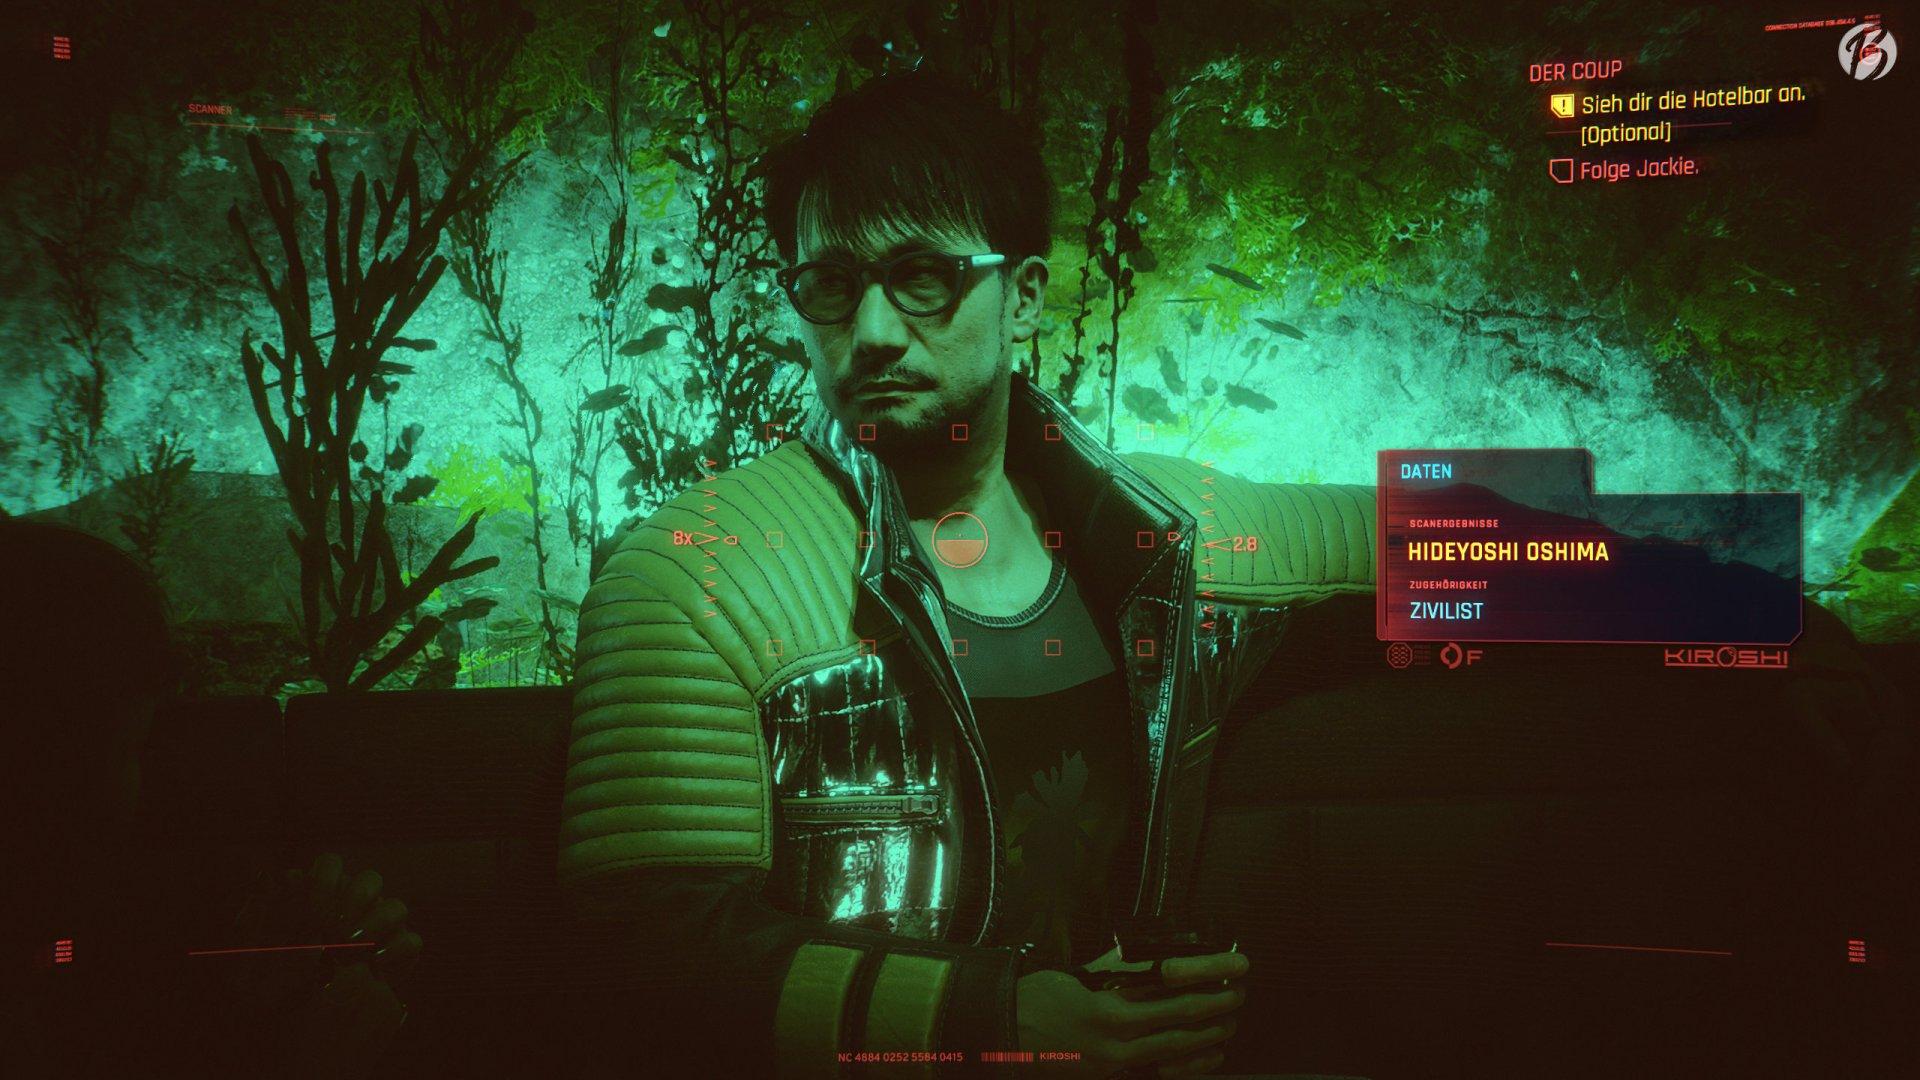 Cyberpunk 2077 - Hideo Kojima versteckt als NPC Hideyoshi Oshima